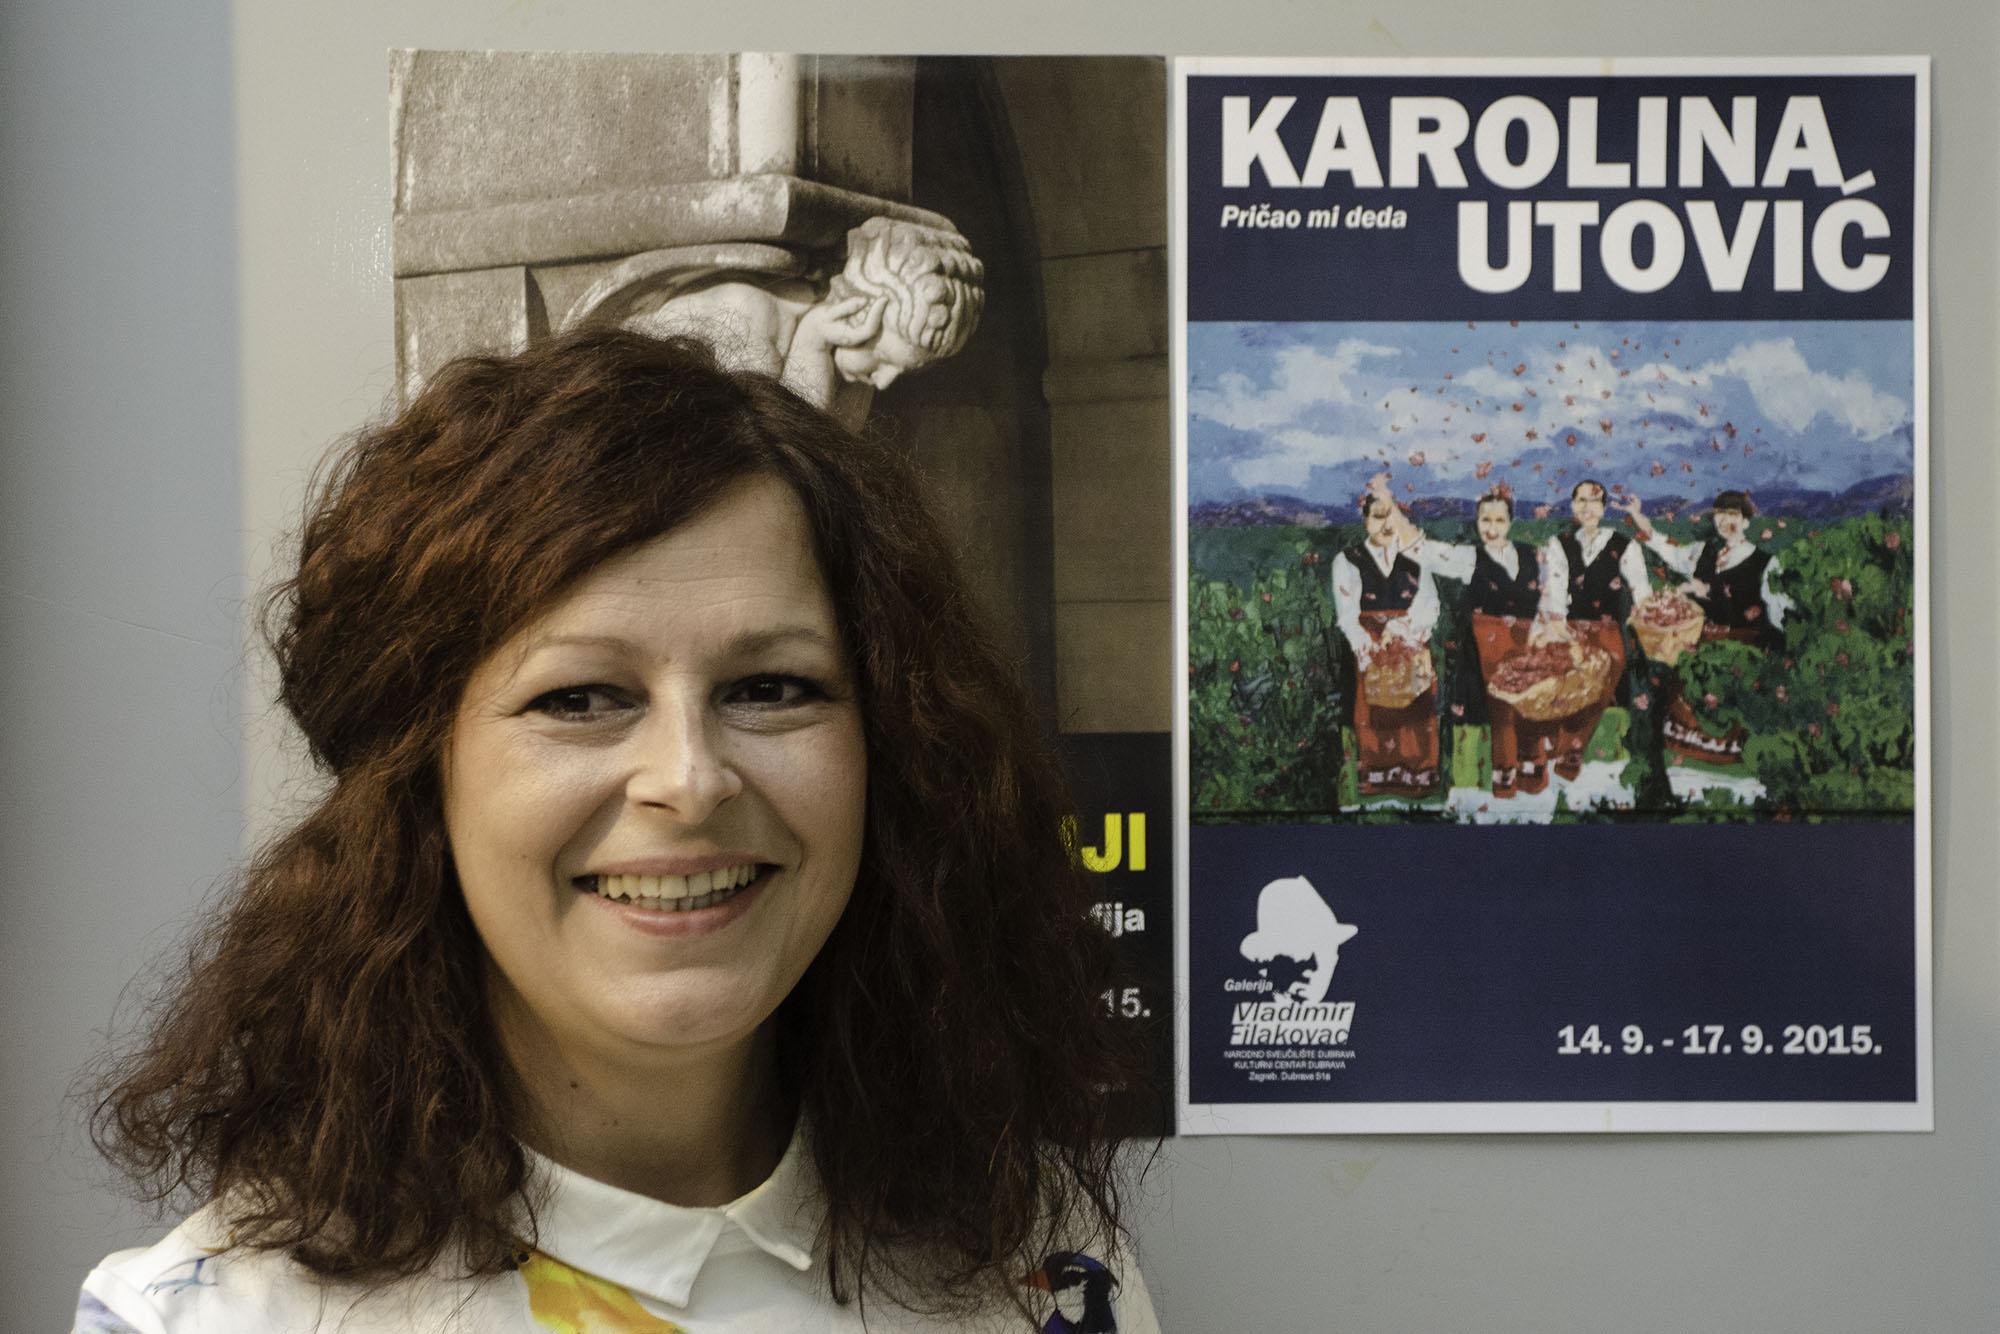 Karolina Utovic (13)